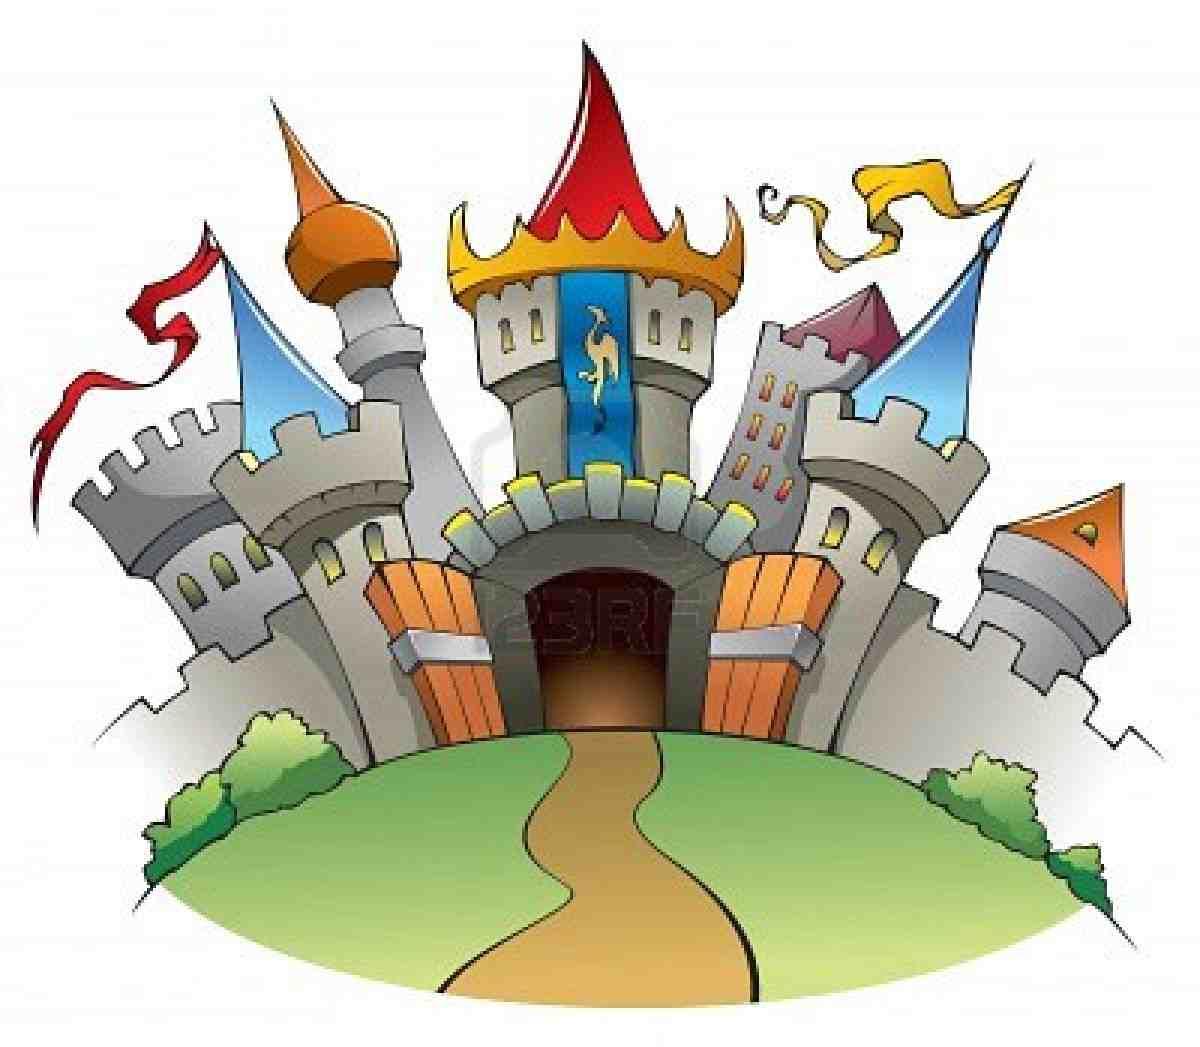 fairytale castle clipart-fairytale castle clipart-1